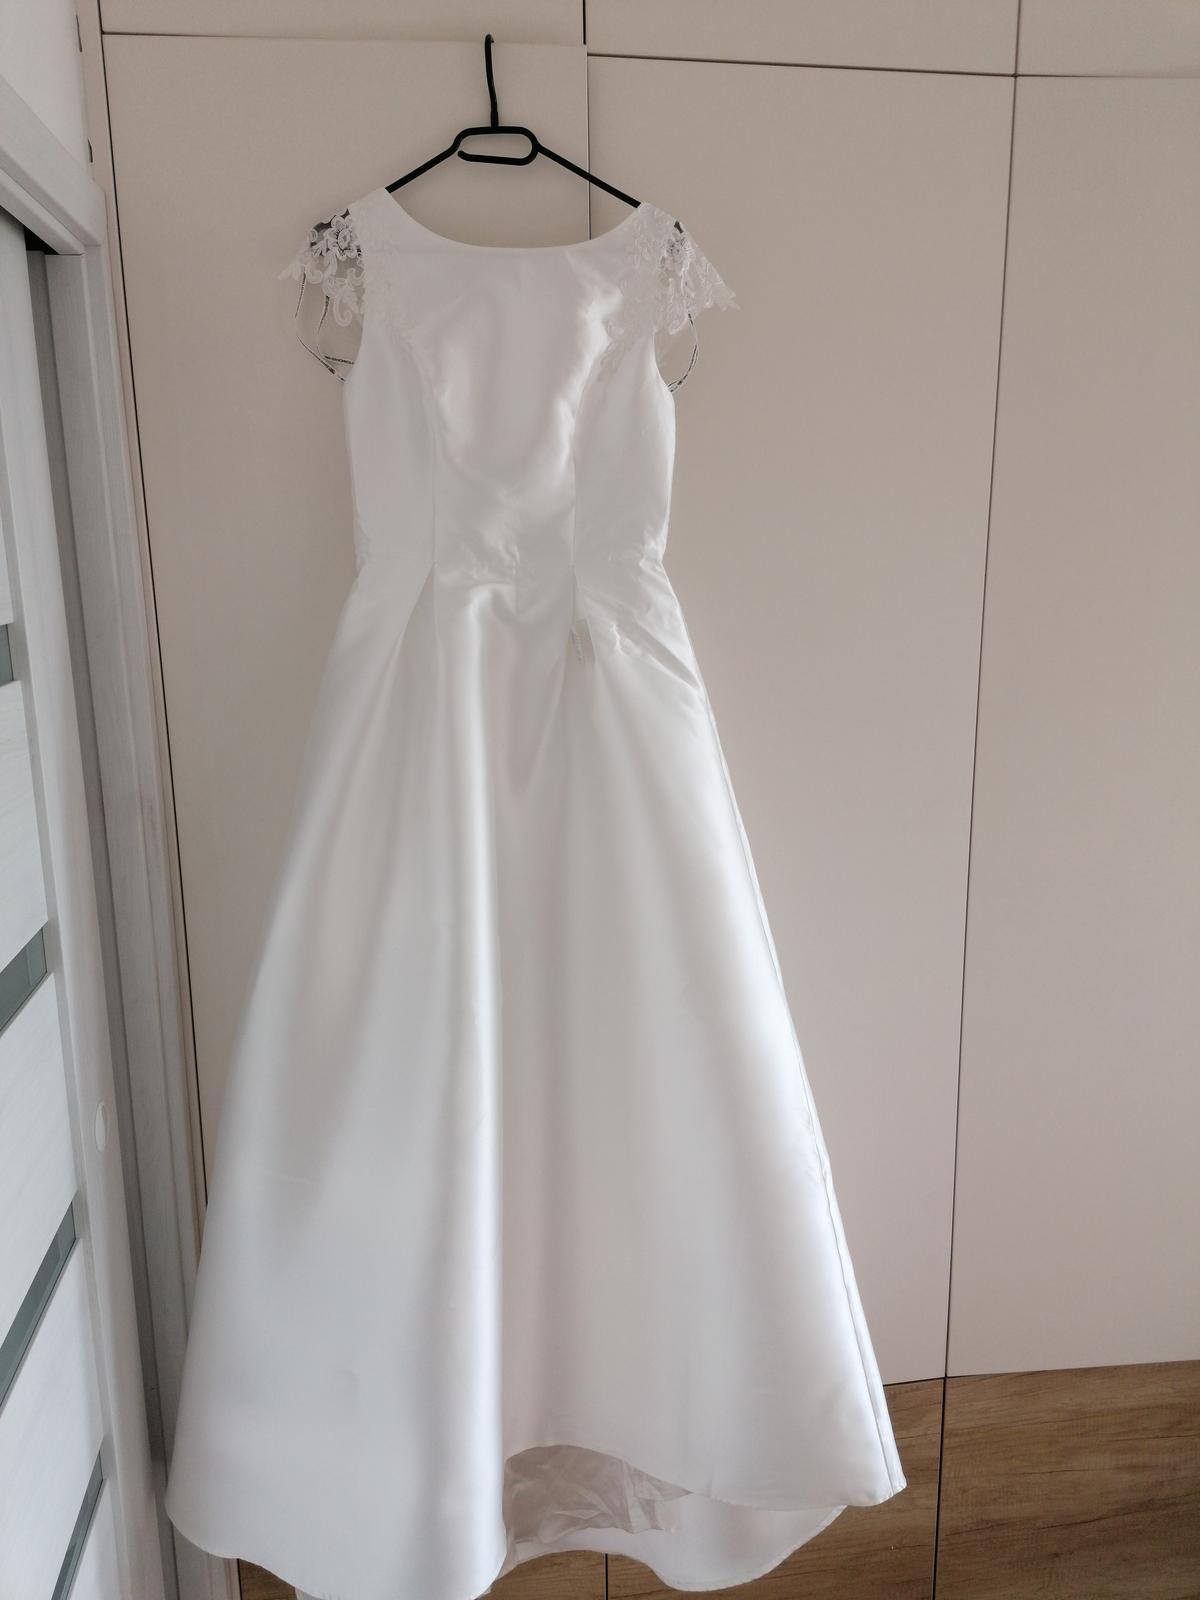 Nové svadobné šaty - Obrázok č. 1